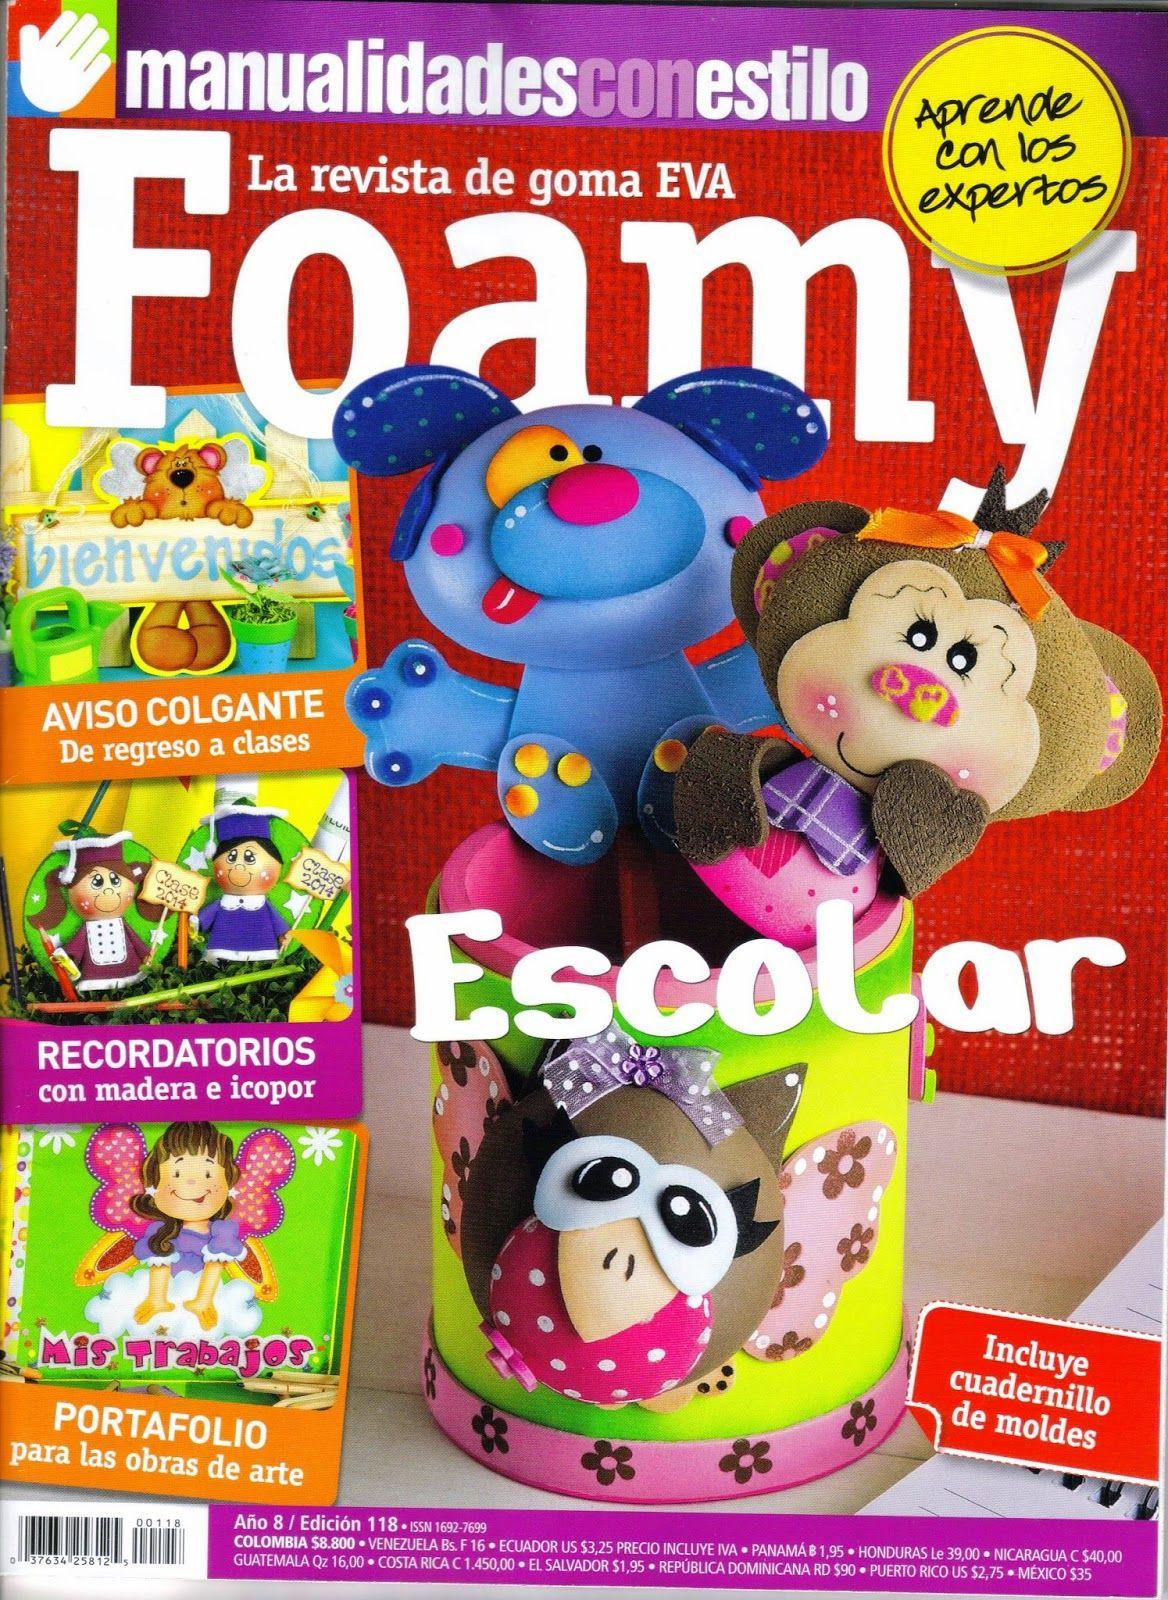 7d73981fdc5 Revistas de manualidades Gratis  Revistas gratis manualidades con estilo